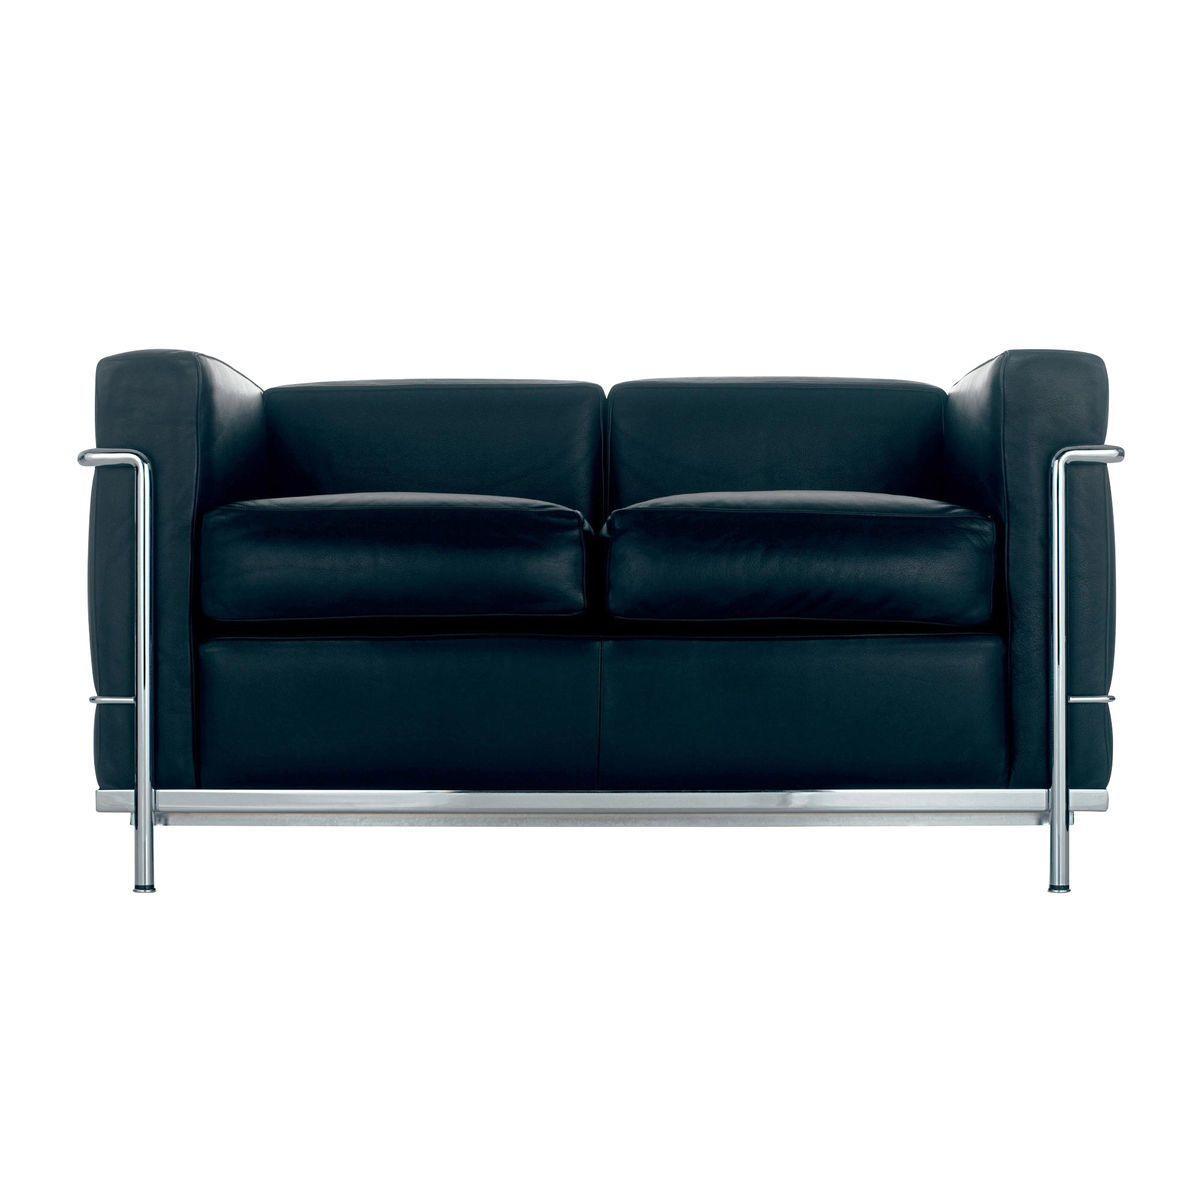 eames chair cushion u shaped glides le corbusier lc2 sofa cassina   ambientedirect.com